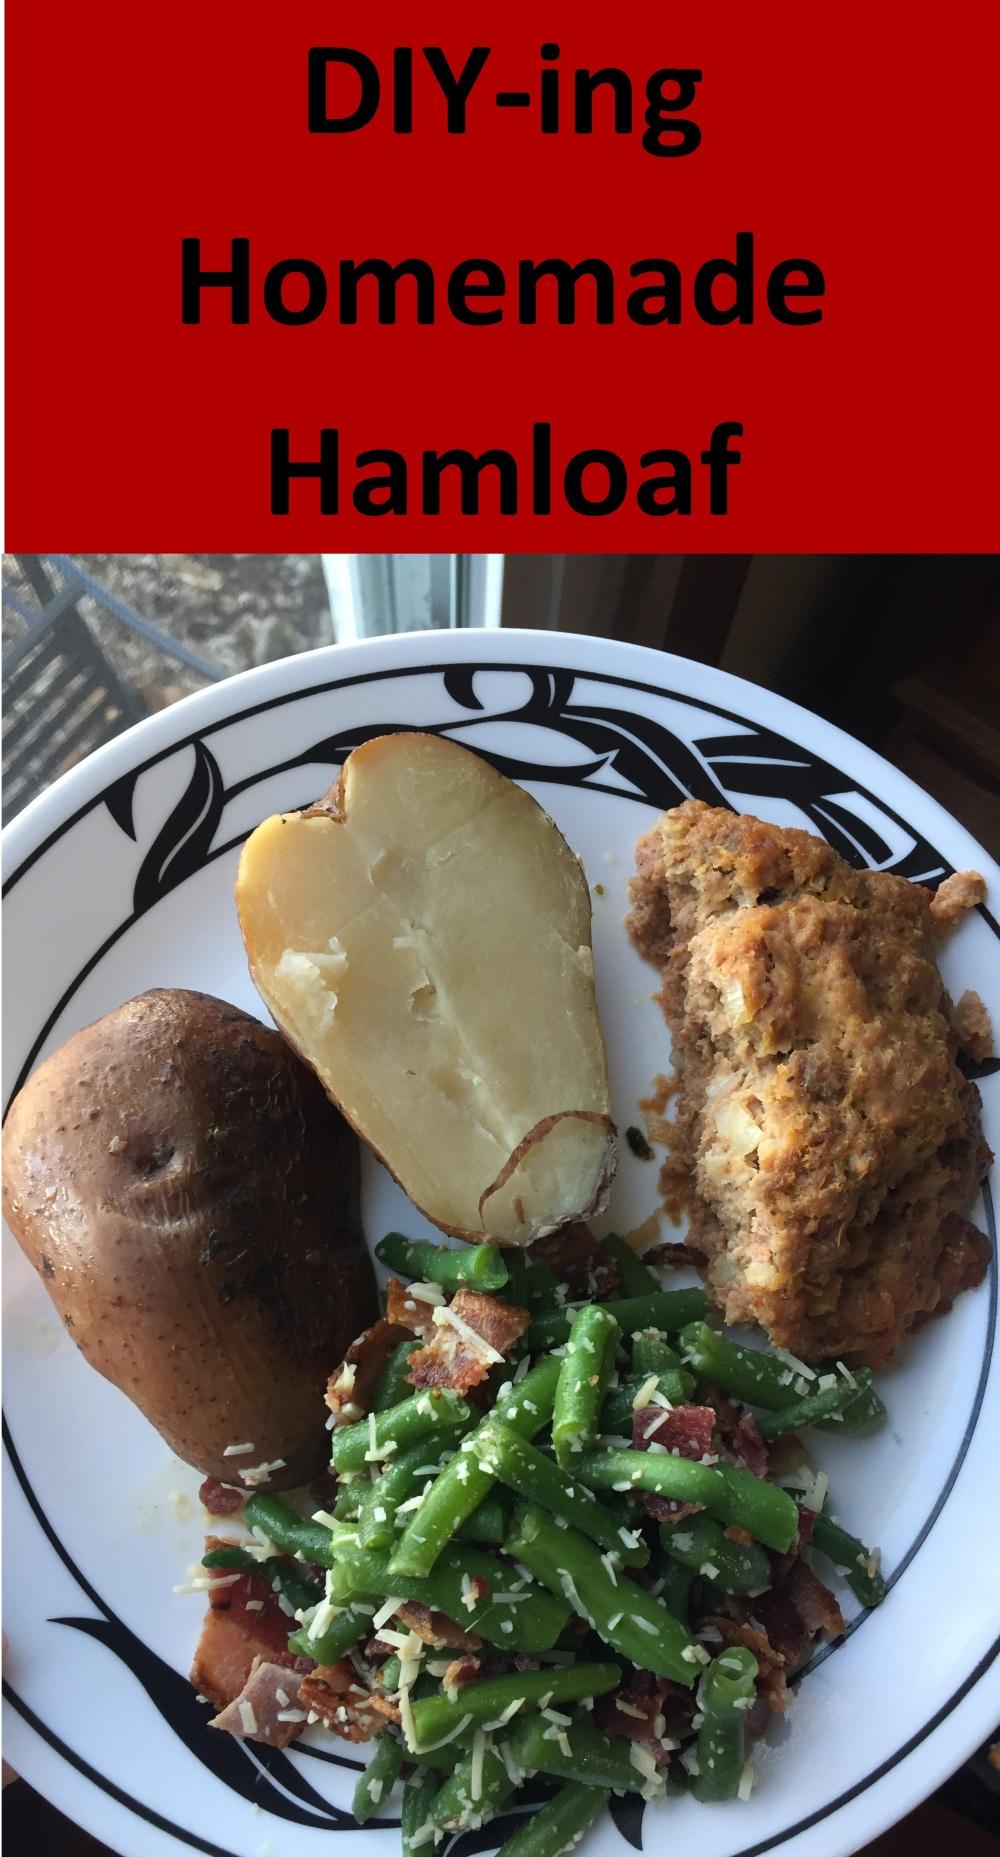 DIYing Homemade Hamloaf